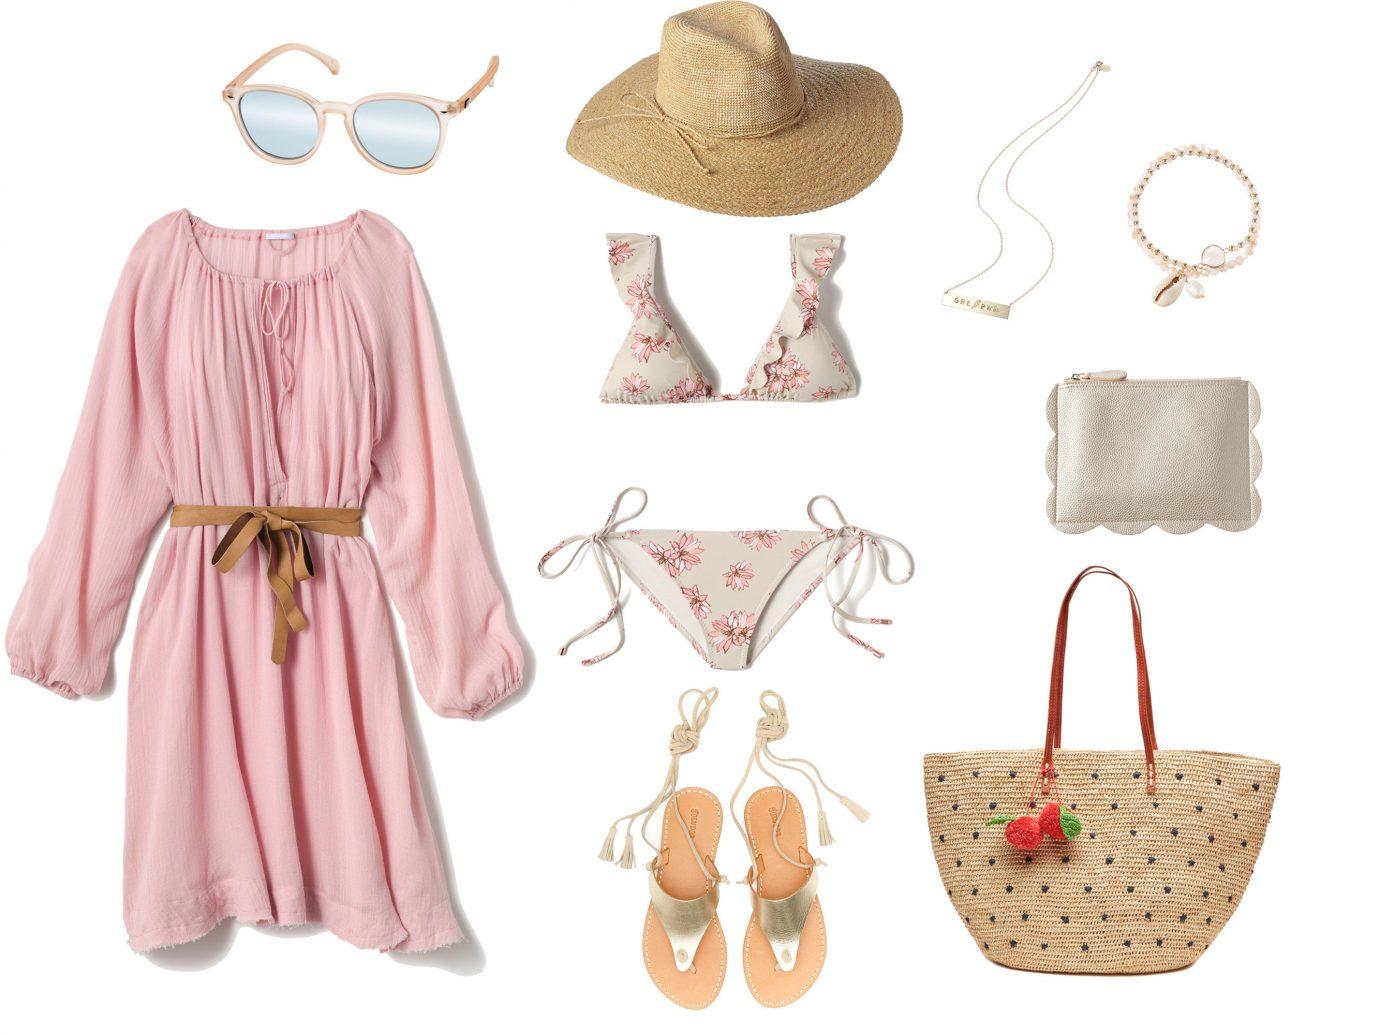 Style + Design pink clothing indoor product clothes hanger shoulder fashion handbag peach shoe pattern costume design arranged several